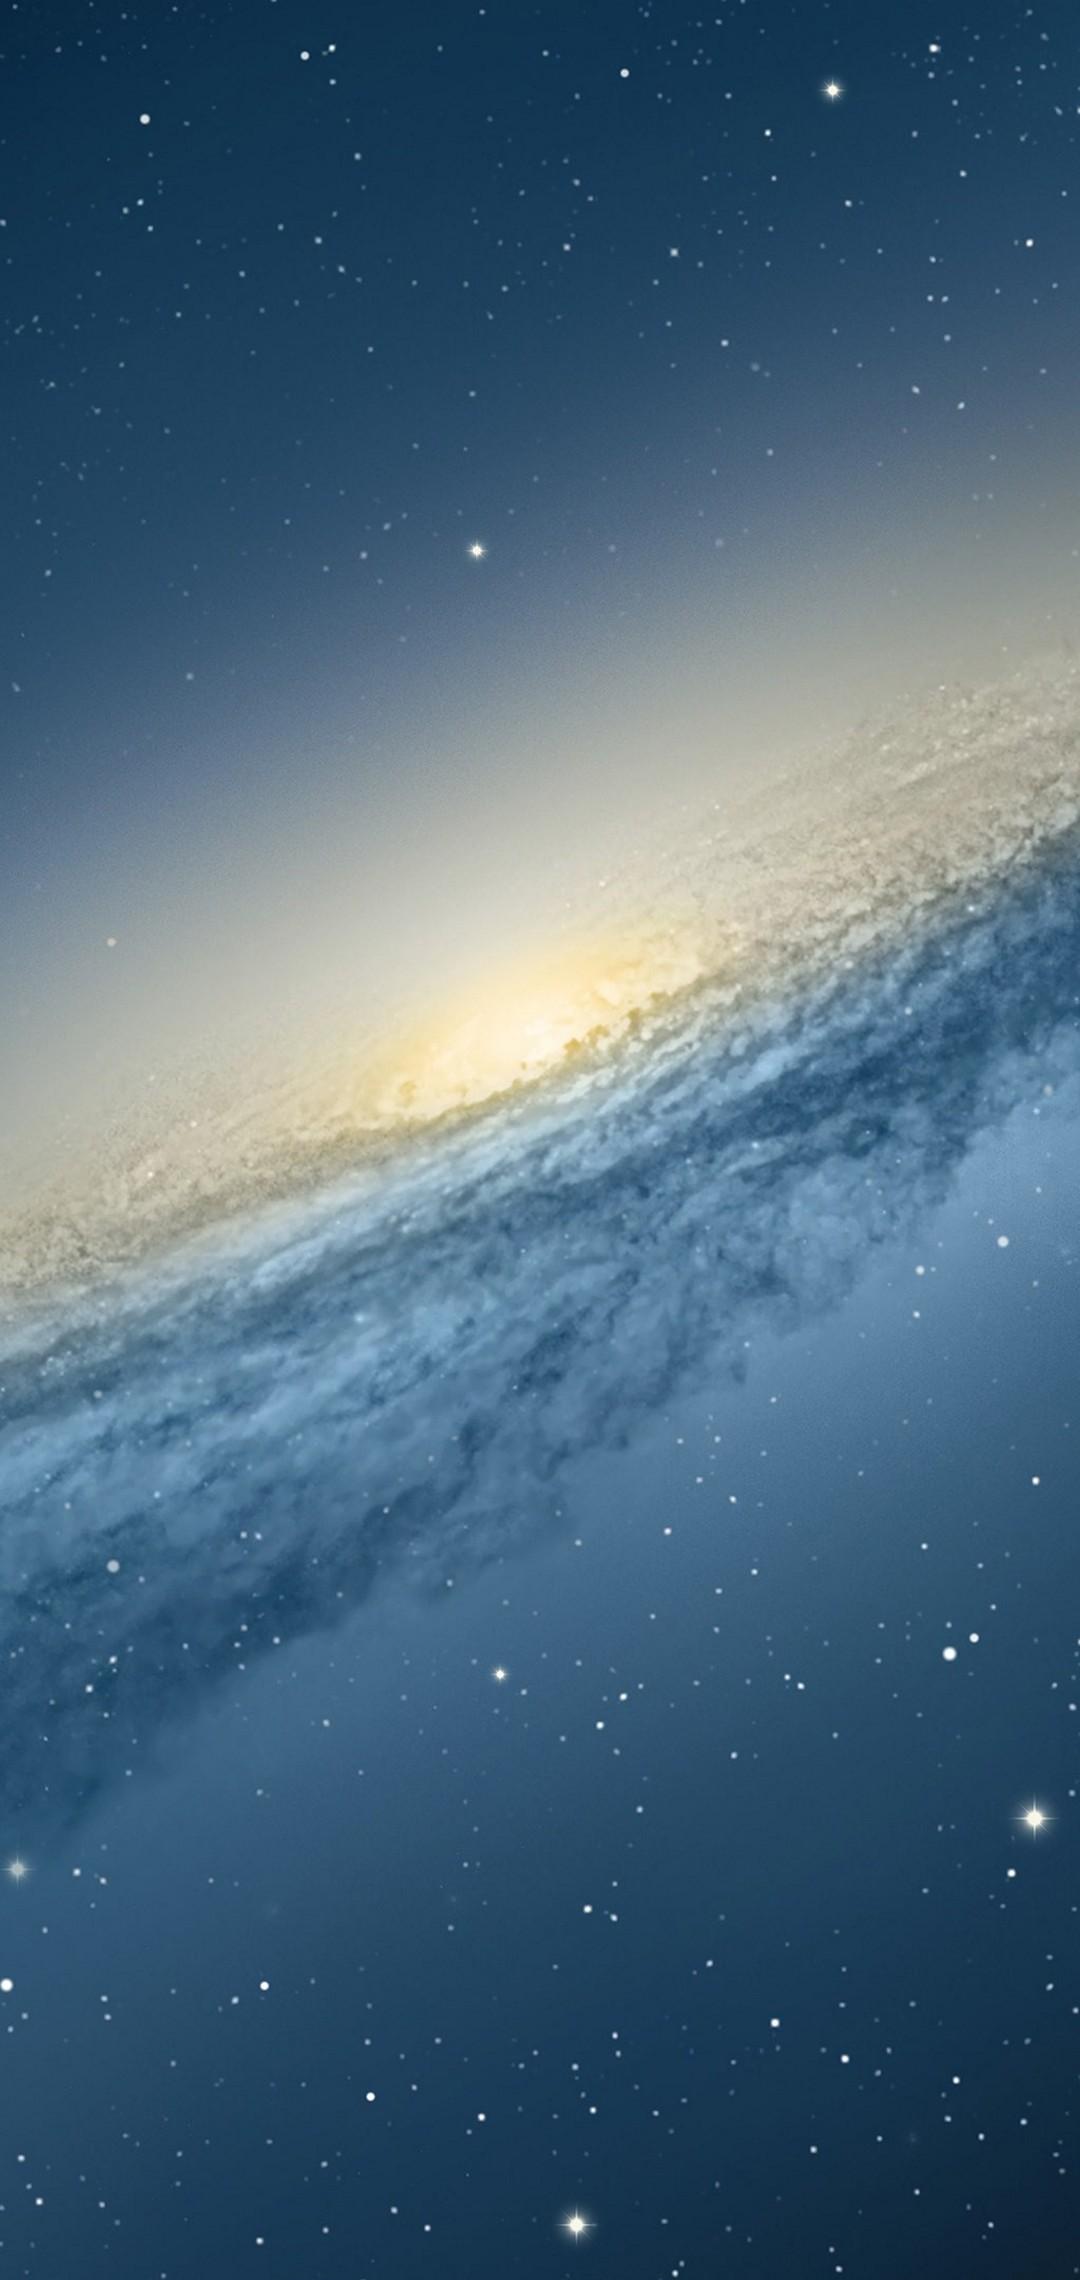 Nintendo Wallpaper Iphone X Scientific Space Planet Galaxy Stars Wallpaper 1080x2280